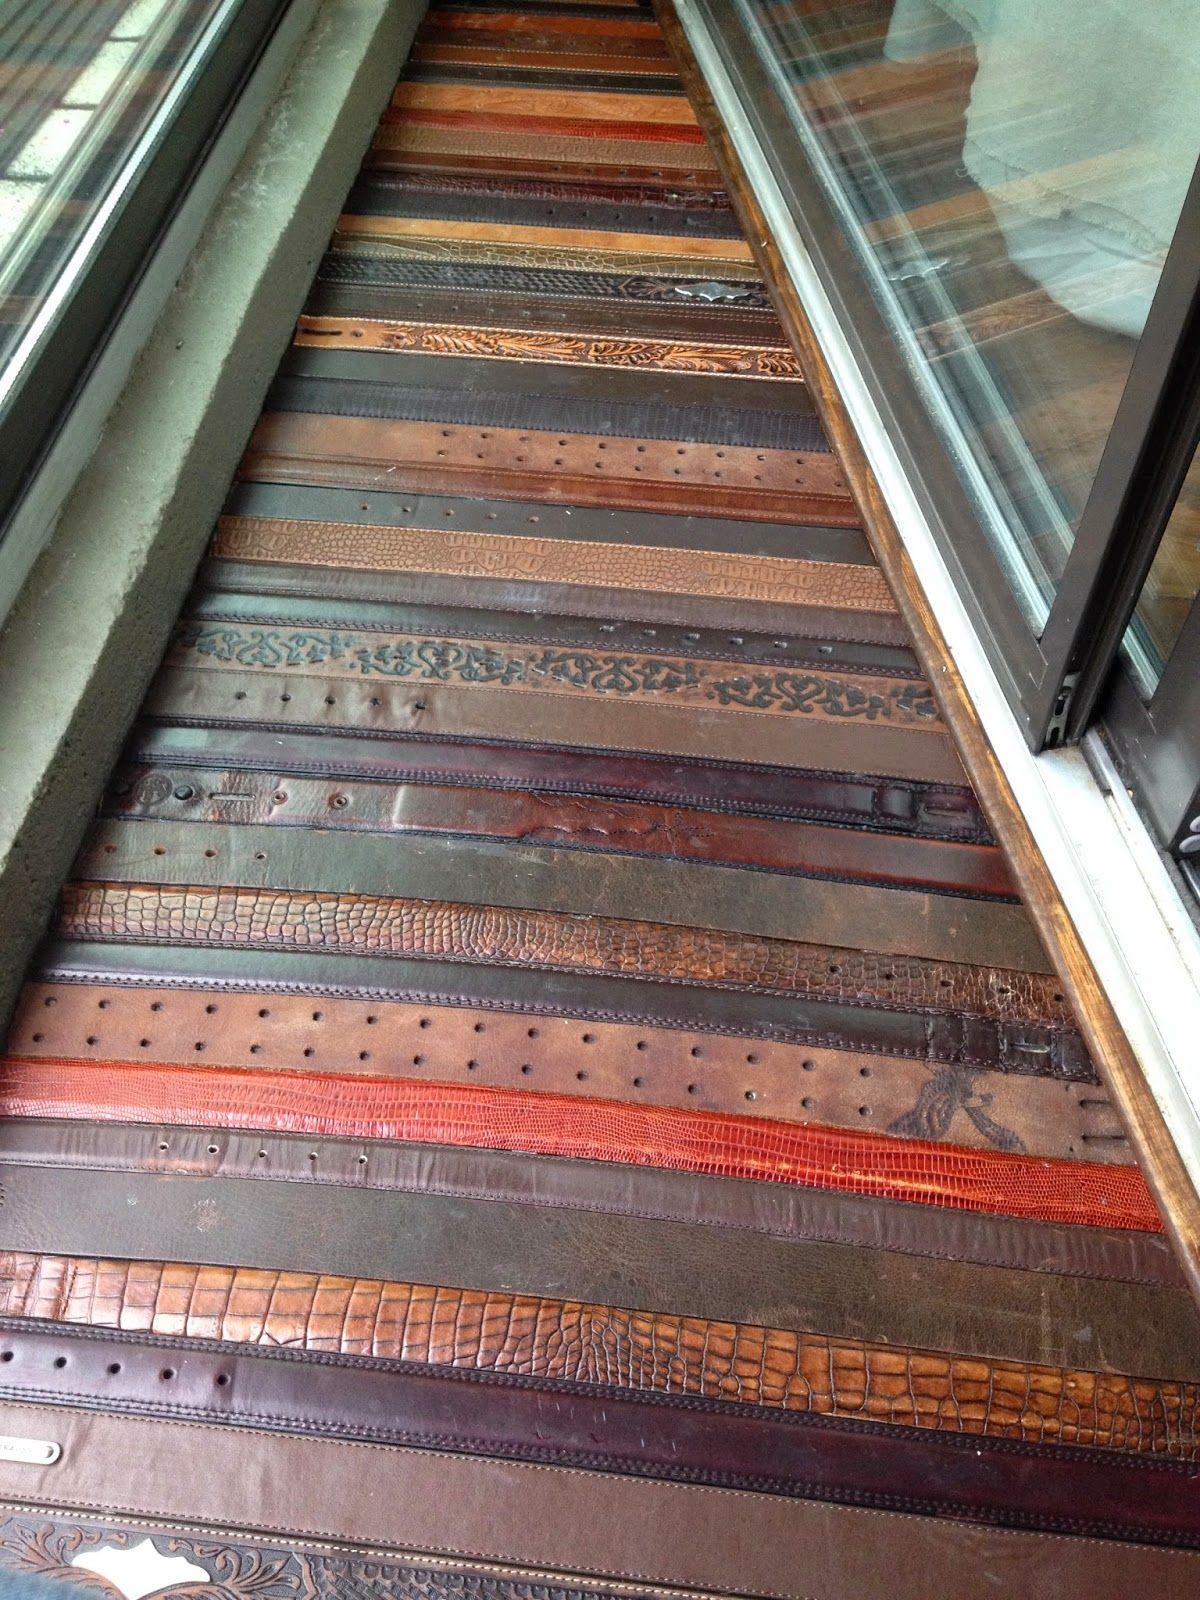 The Suels Repurposed Leather Belt Floors Re Purpose